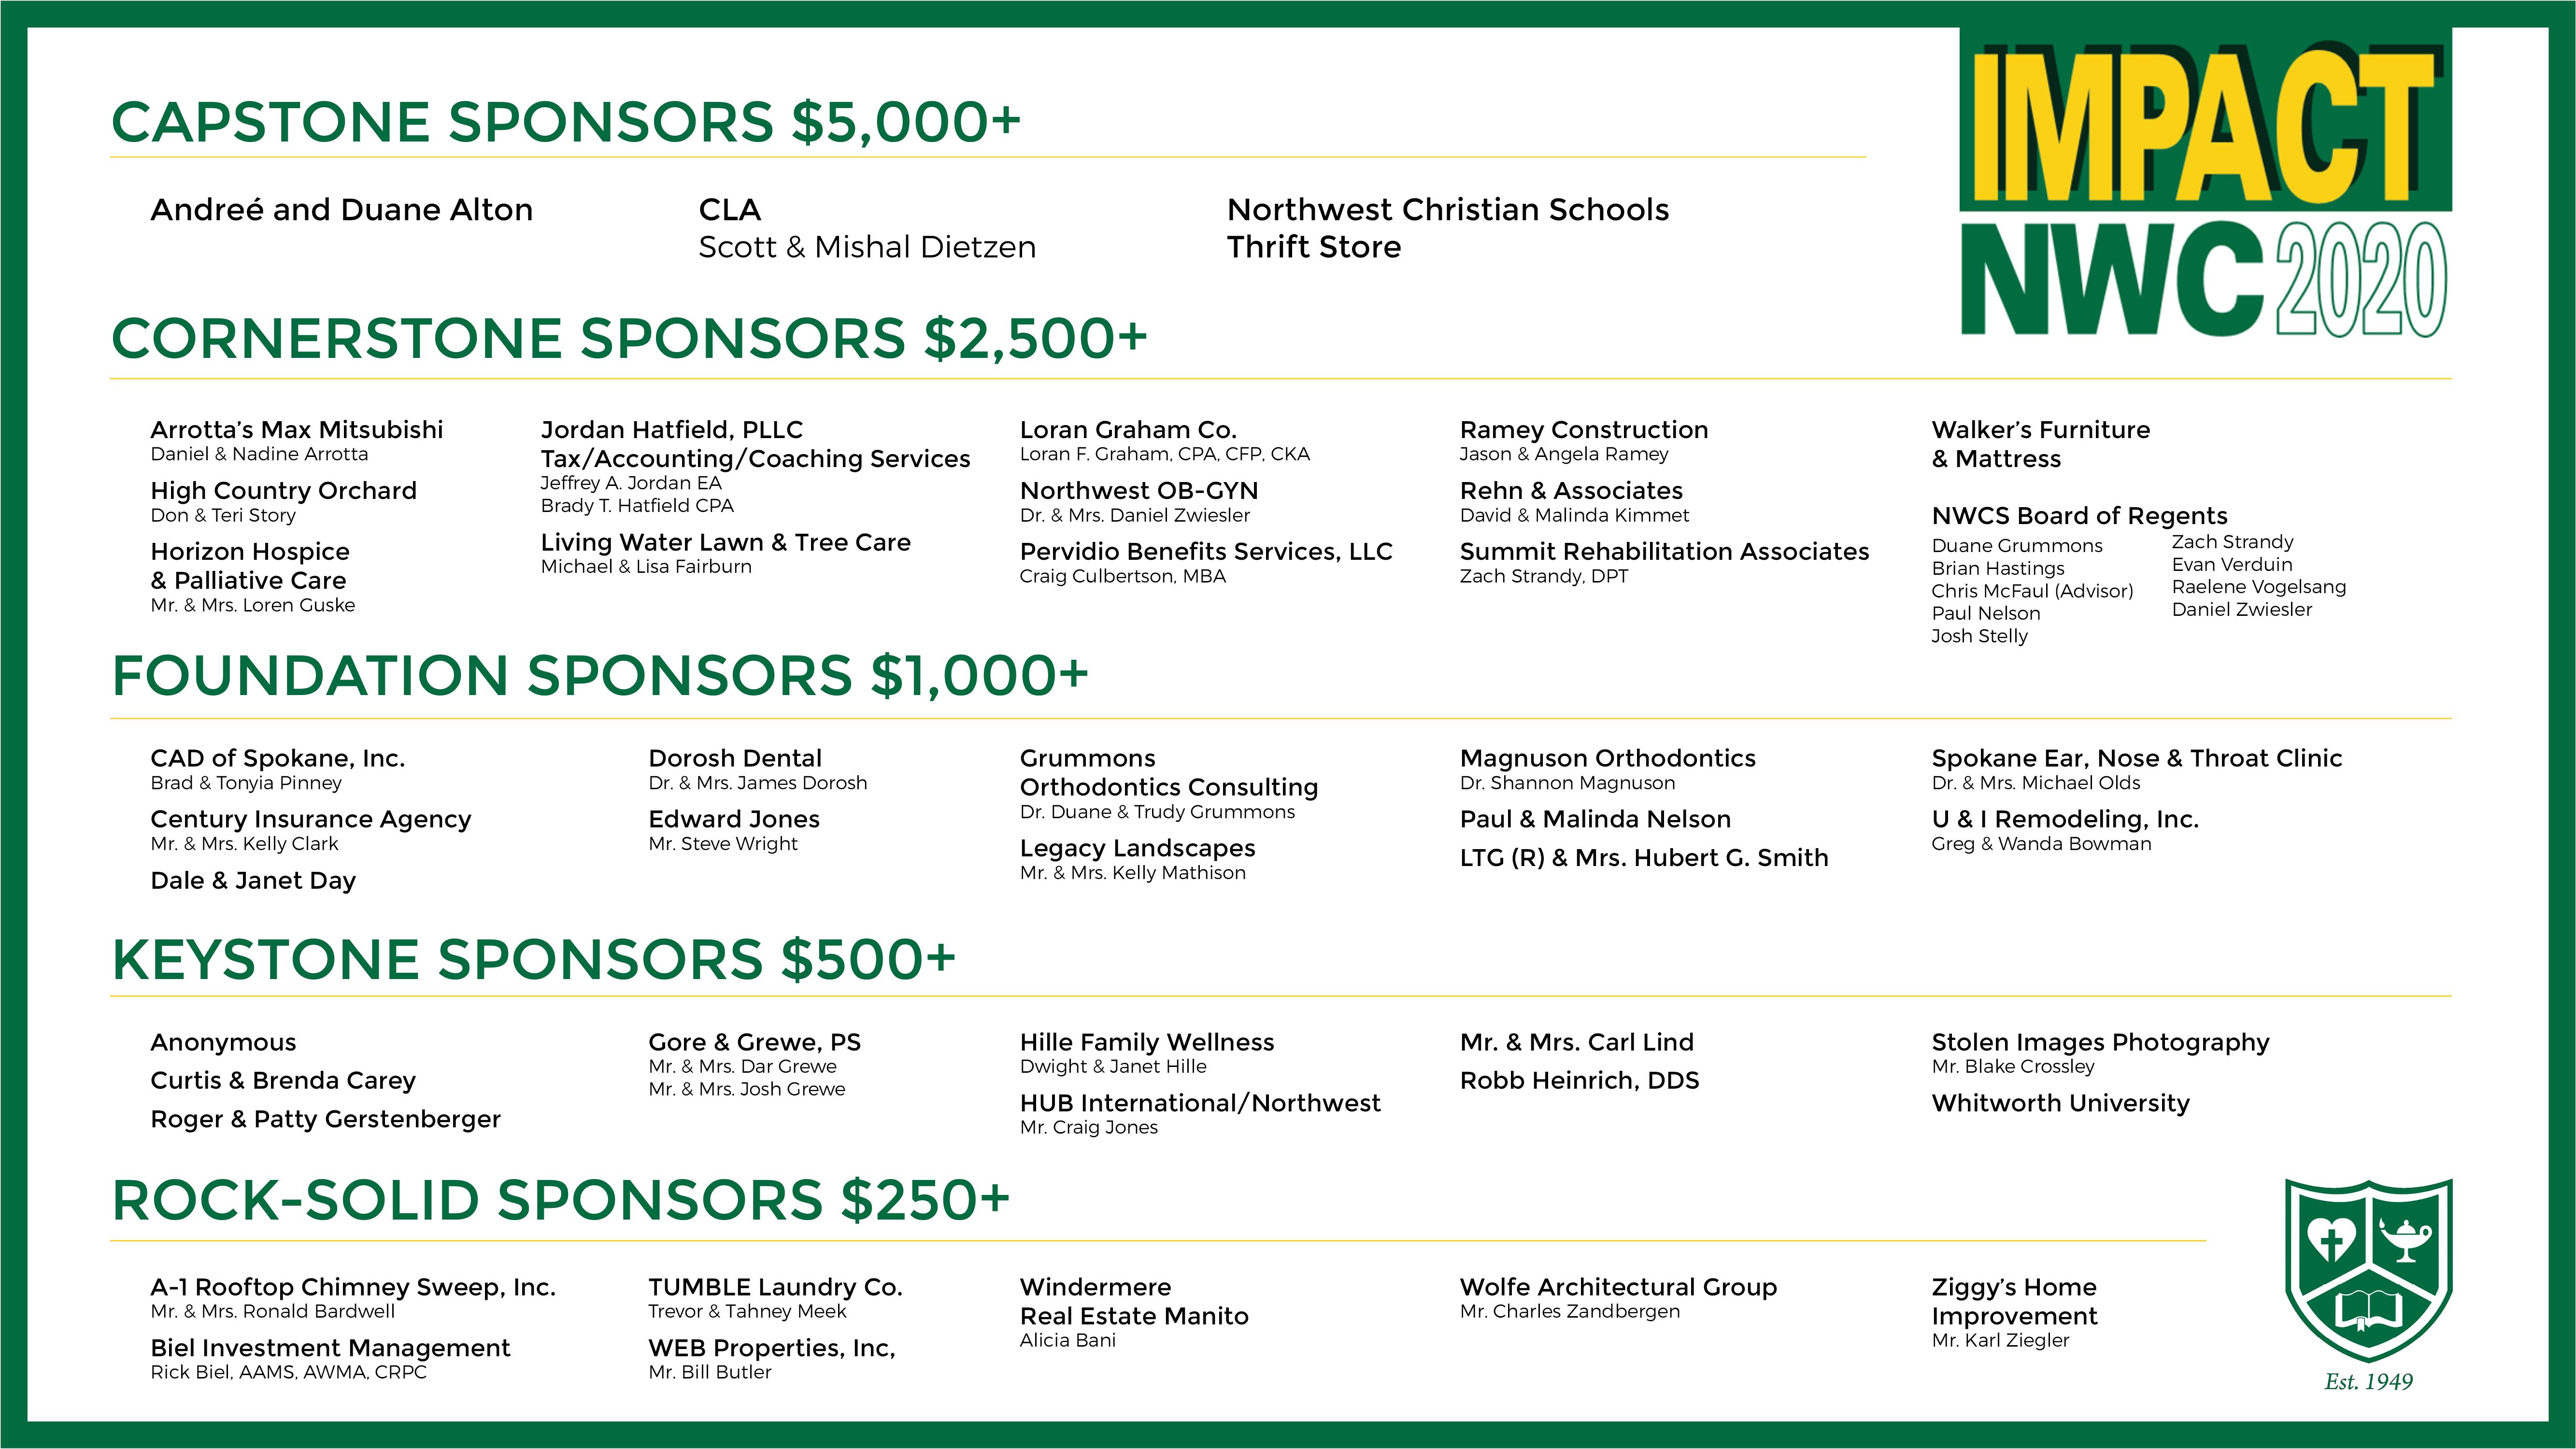 IMPACT NWC 2020 Sponsors